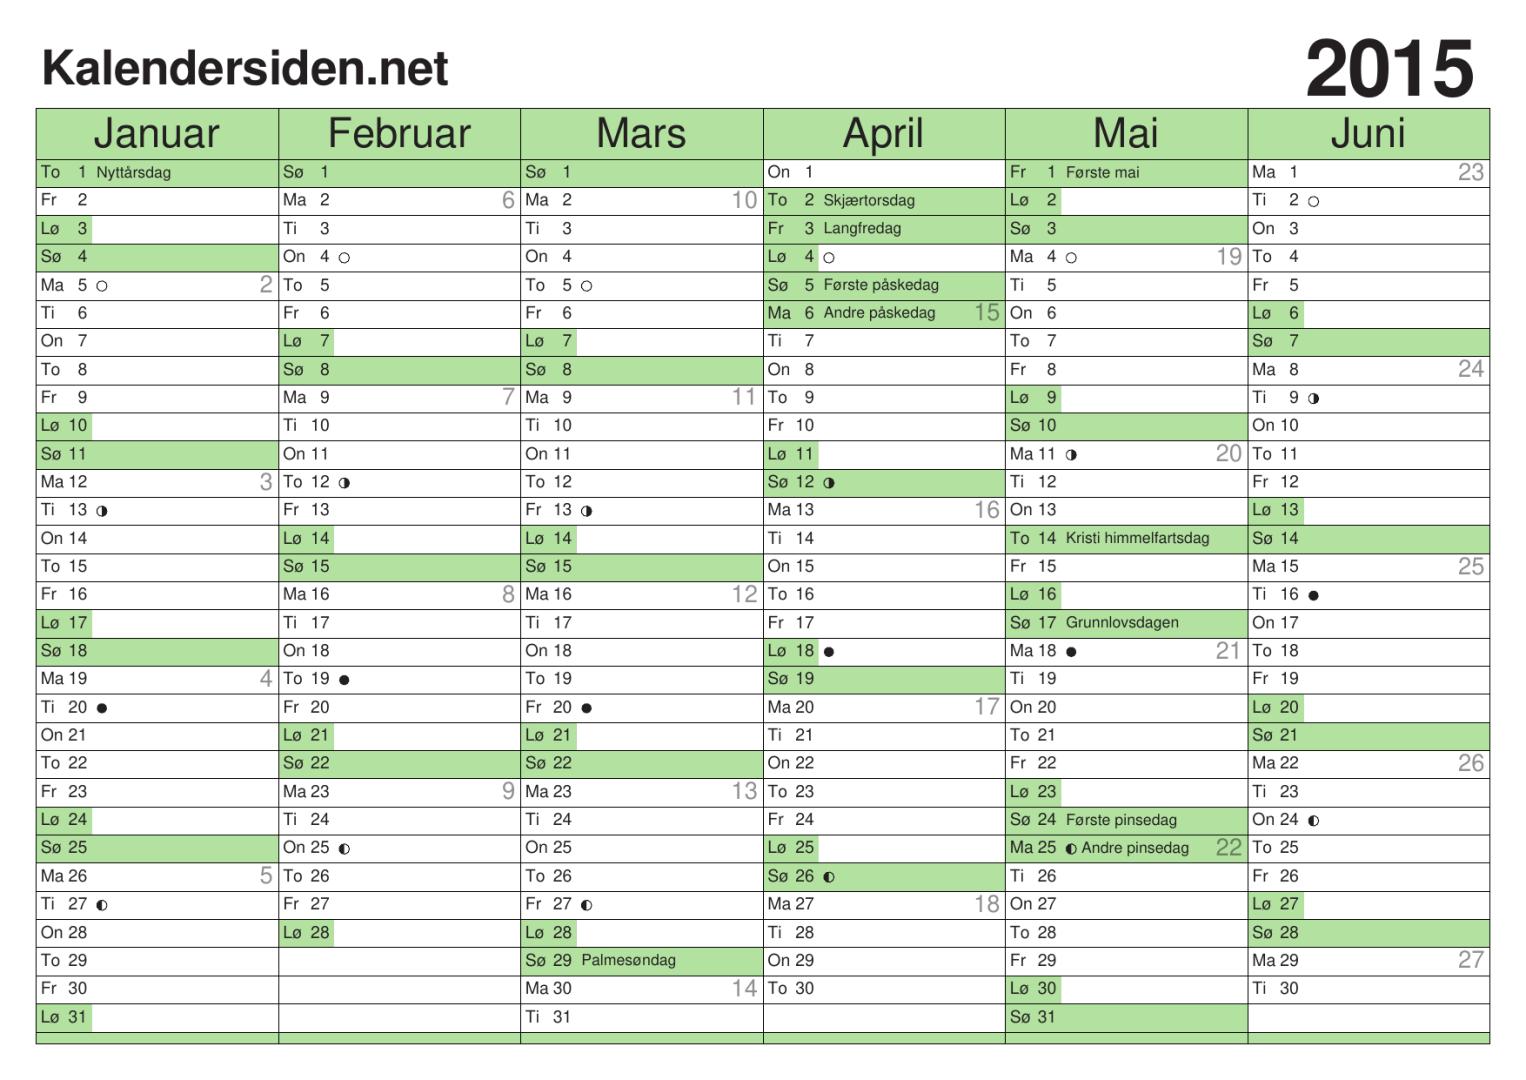 Kalendersiden